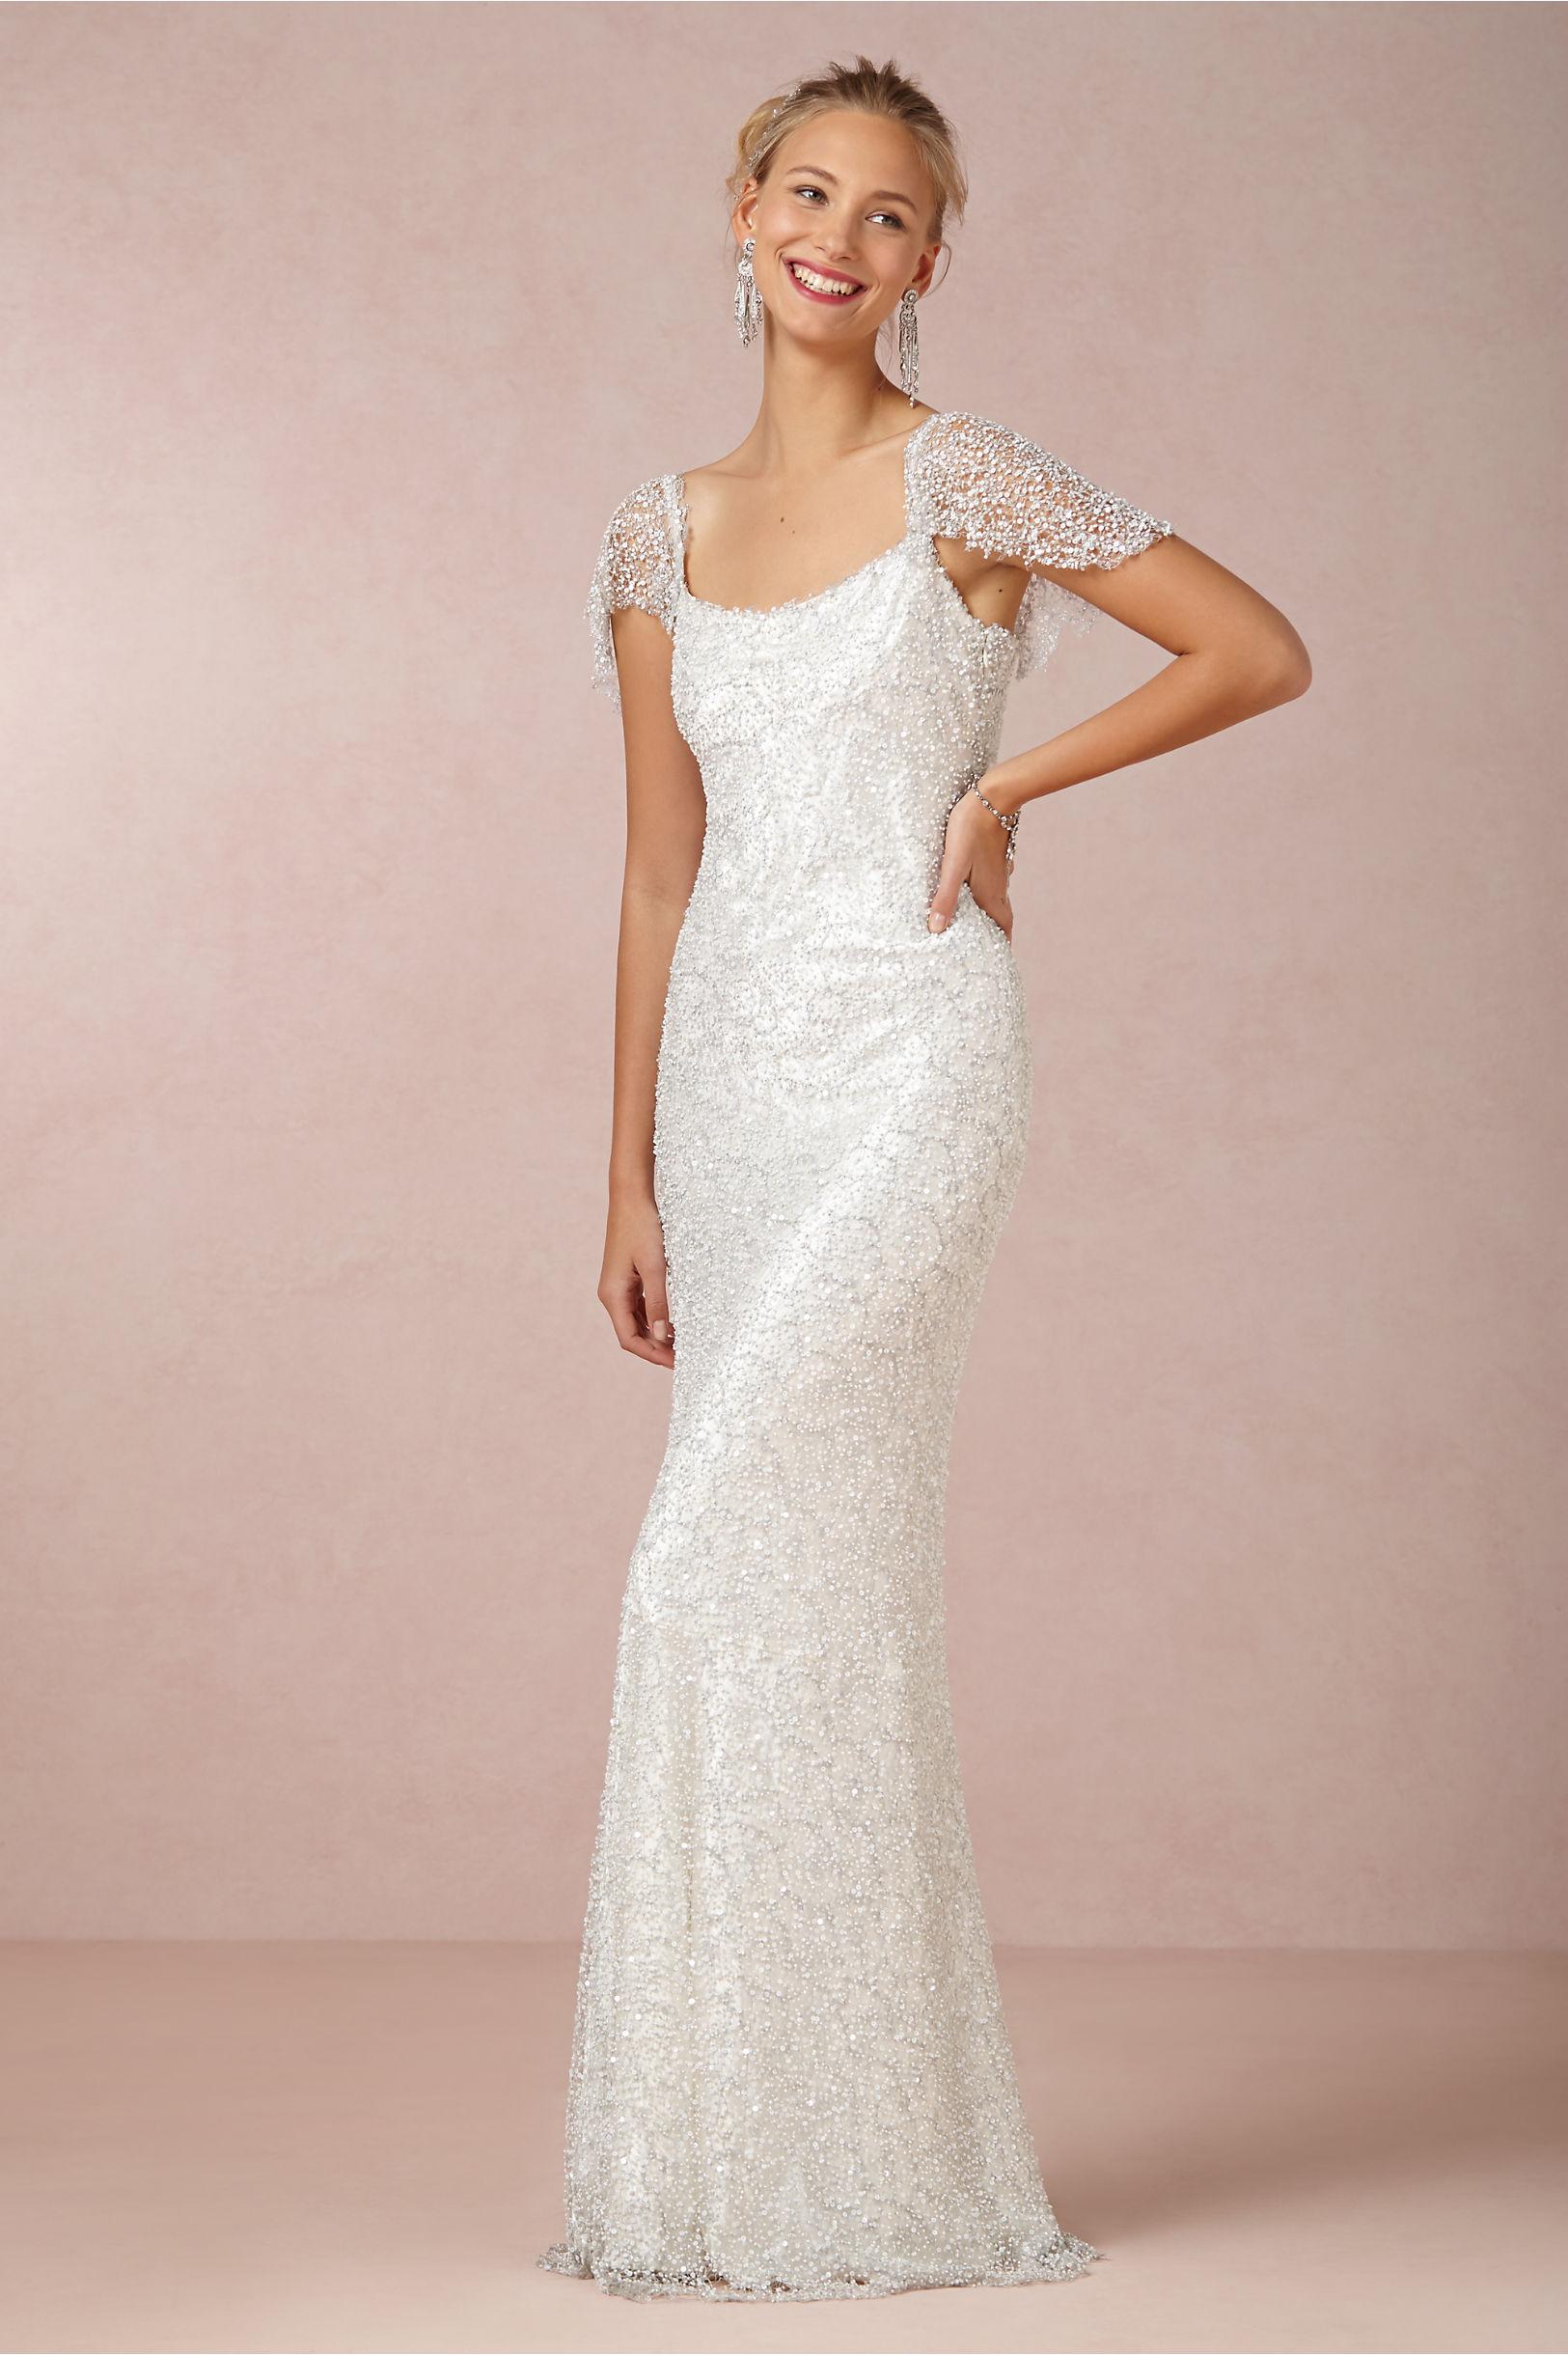 Hipster wedding dresses sleeveswedding dressesdressesss hipster wedding dresses sleeves ombrellifo Images